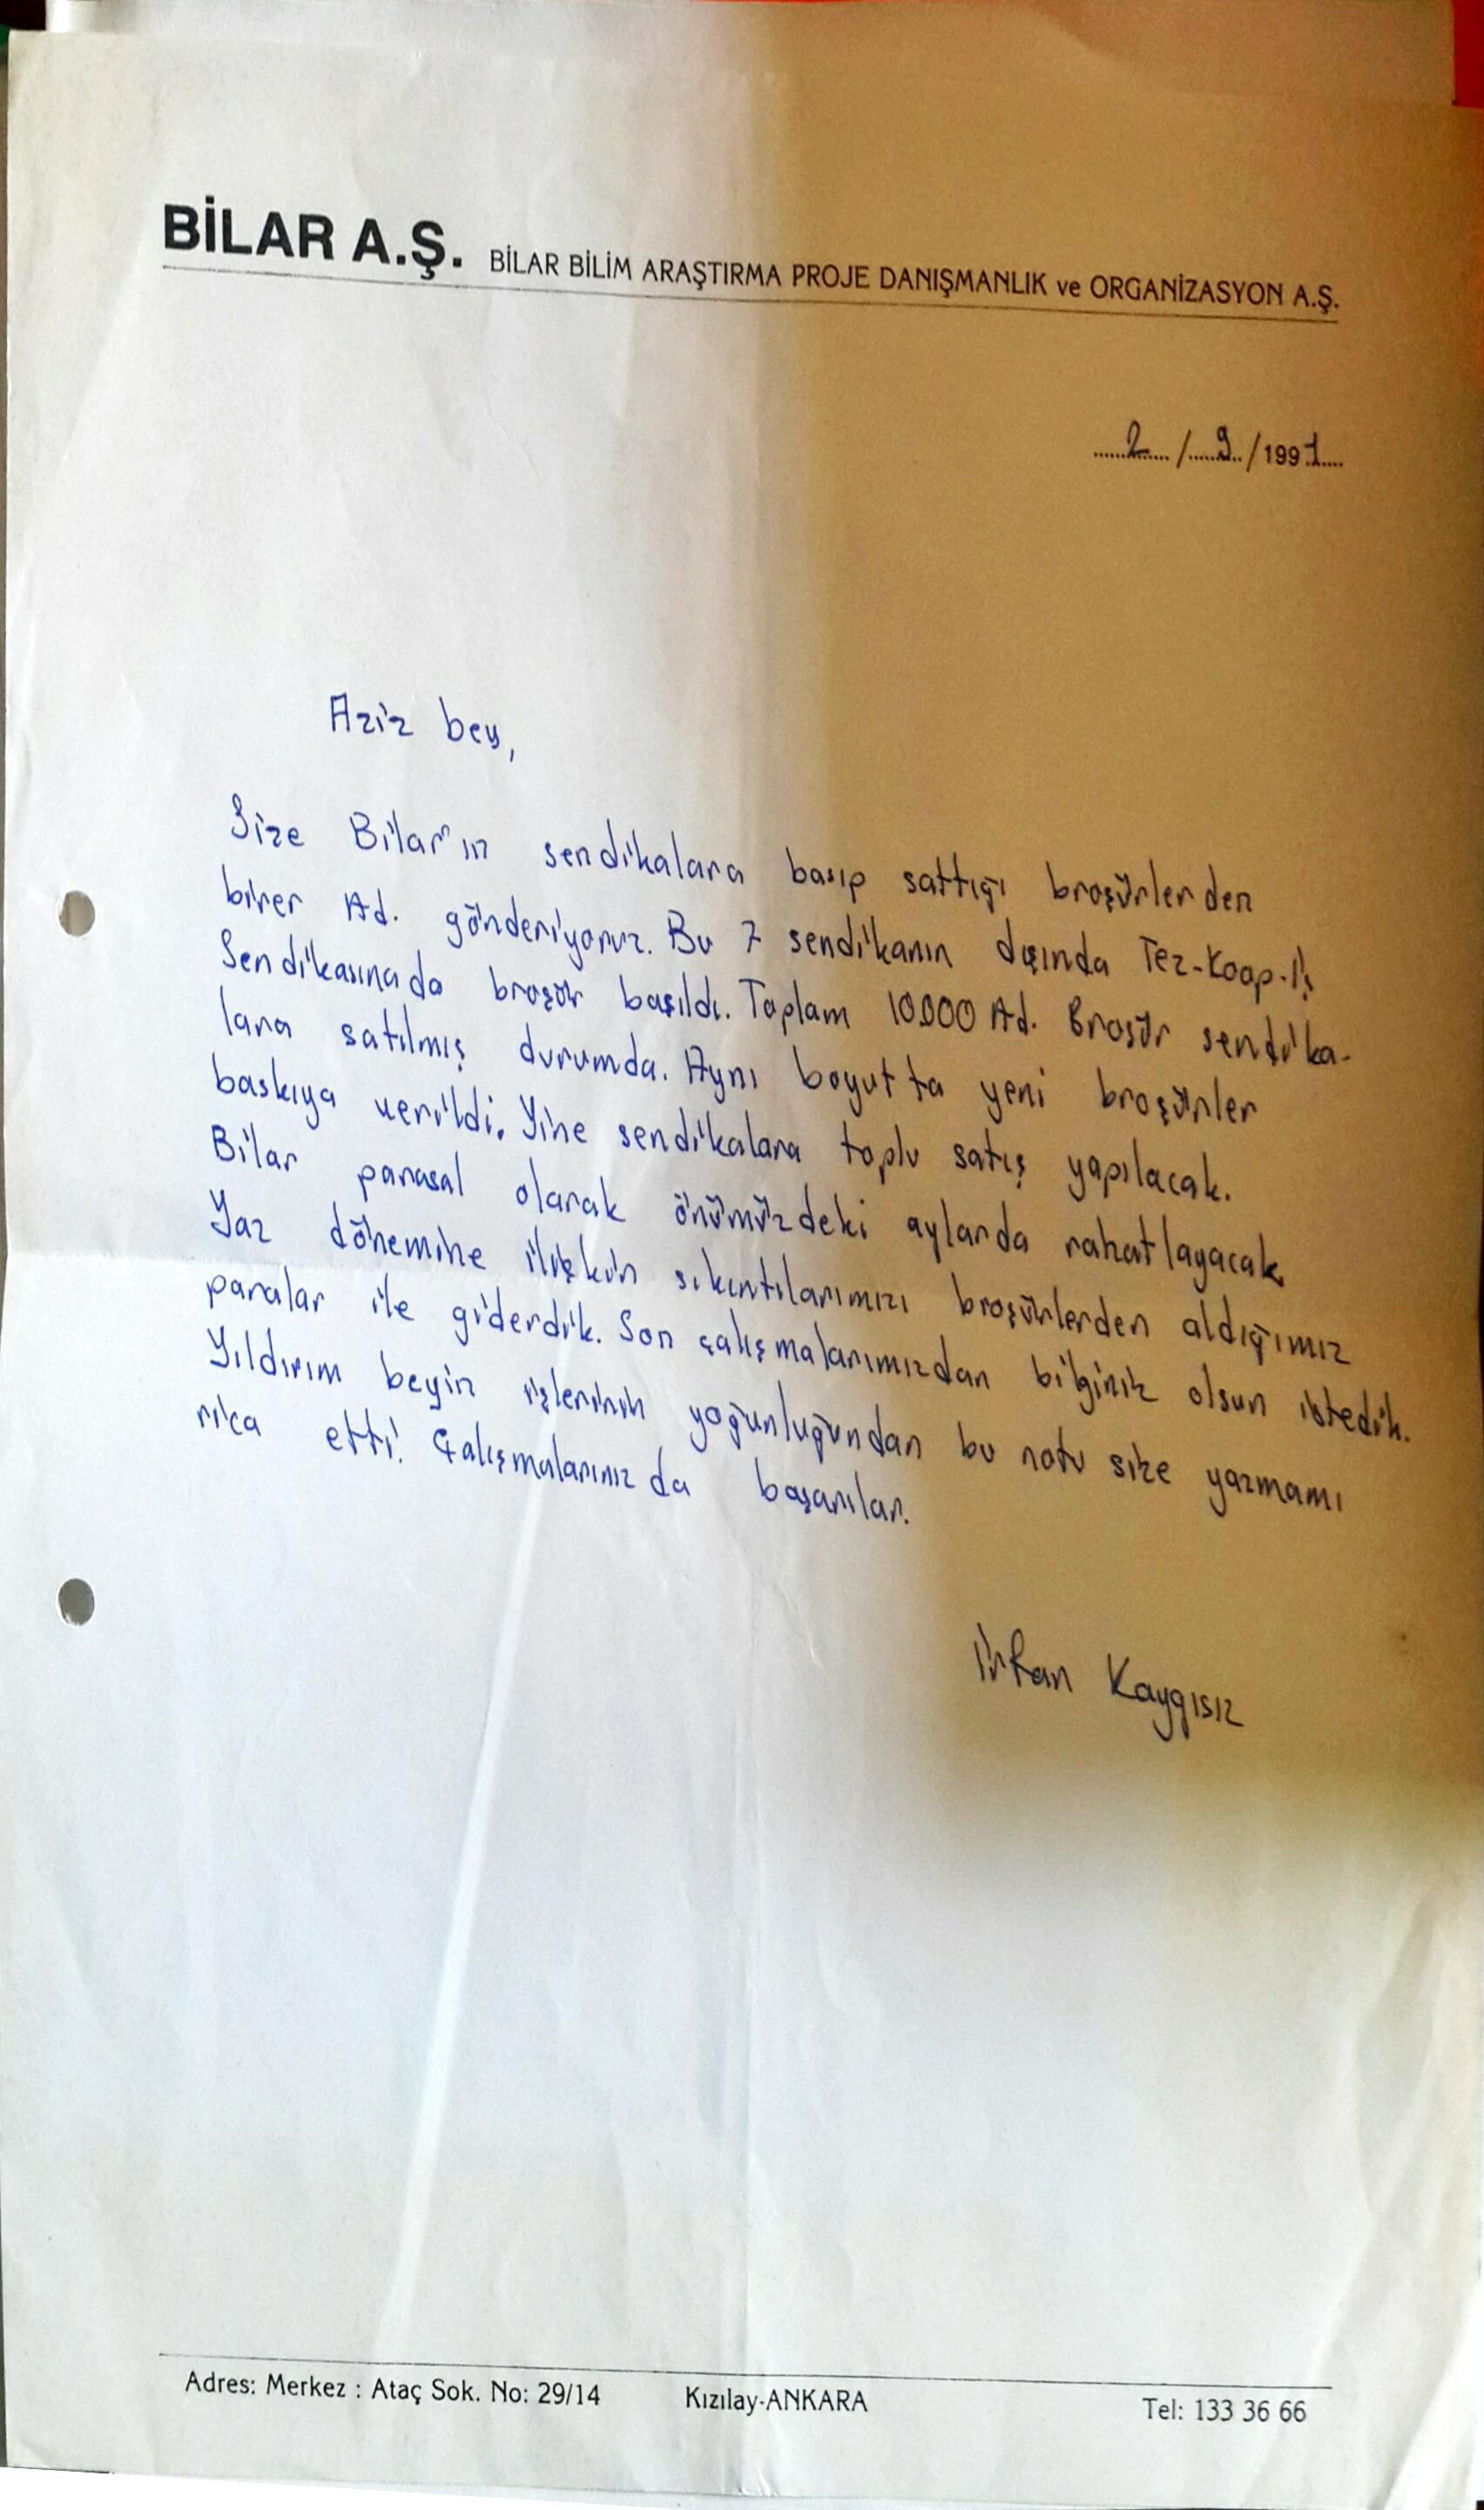 1991_kaygisiz_mektup_mali-durum.jpg